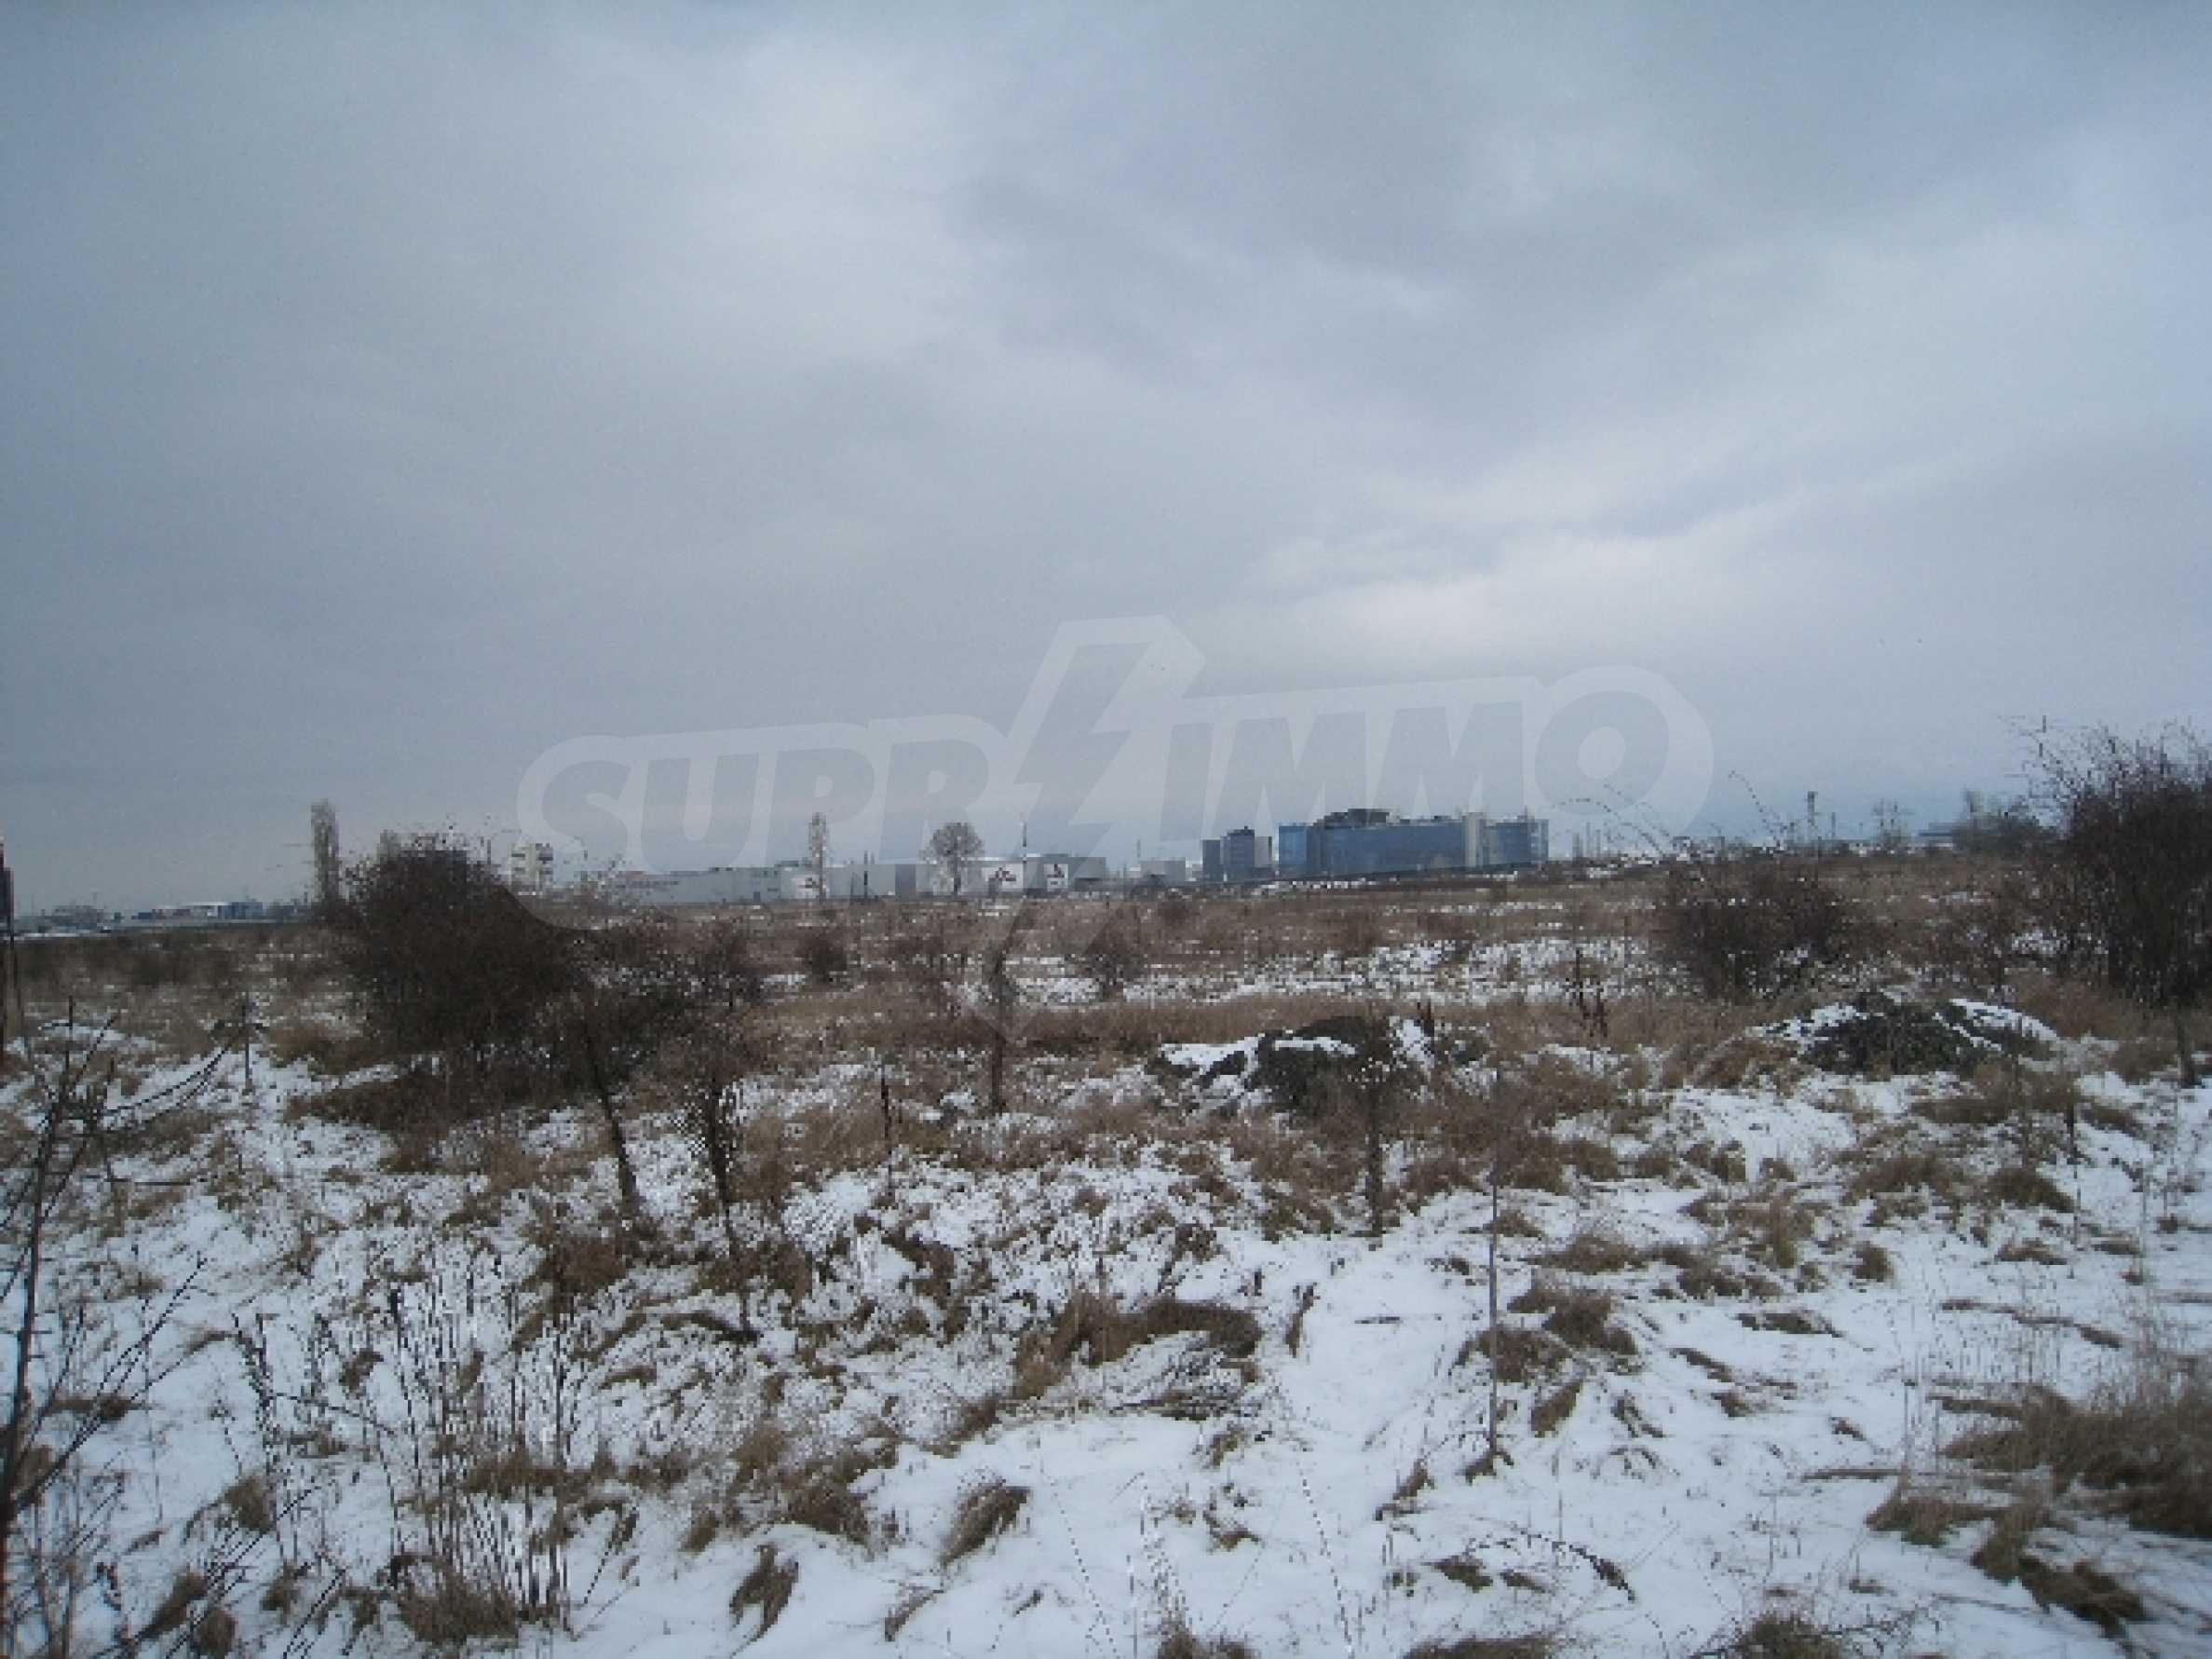 Development land for sale 8